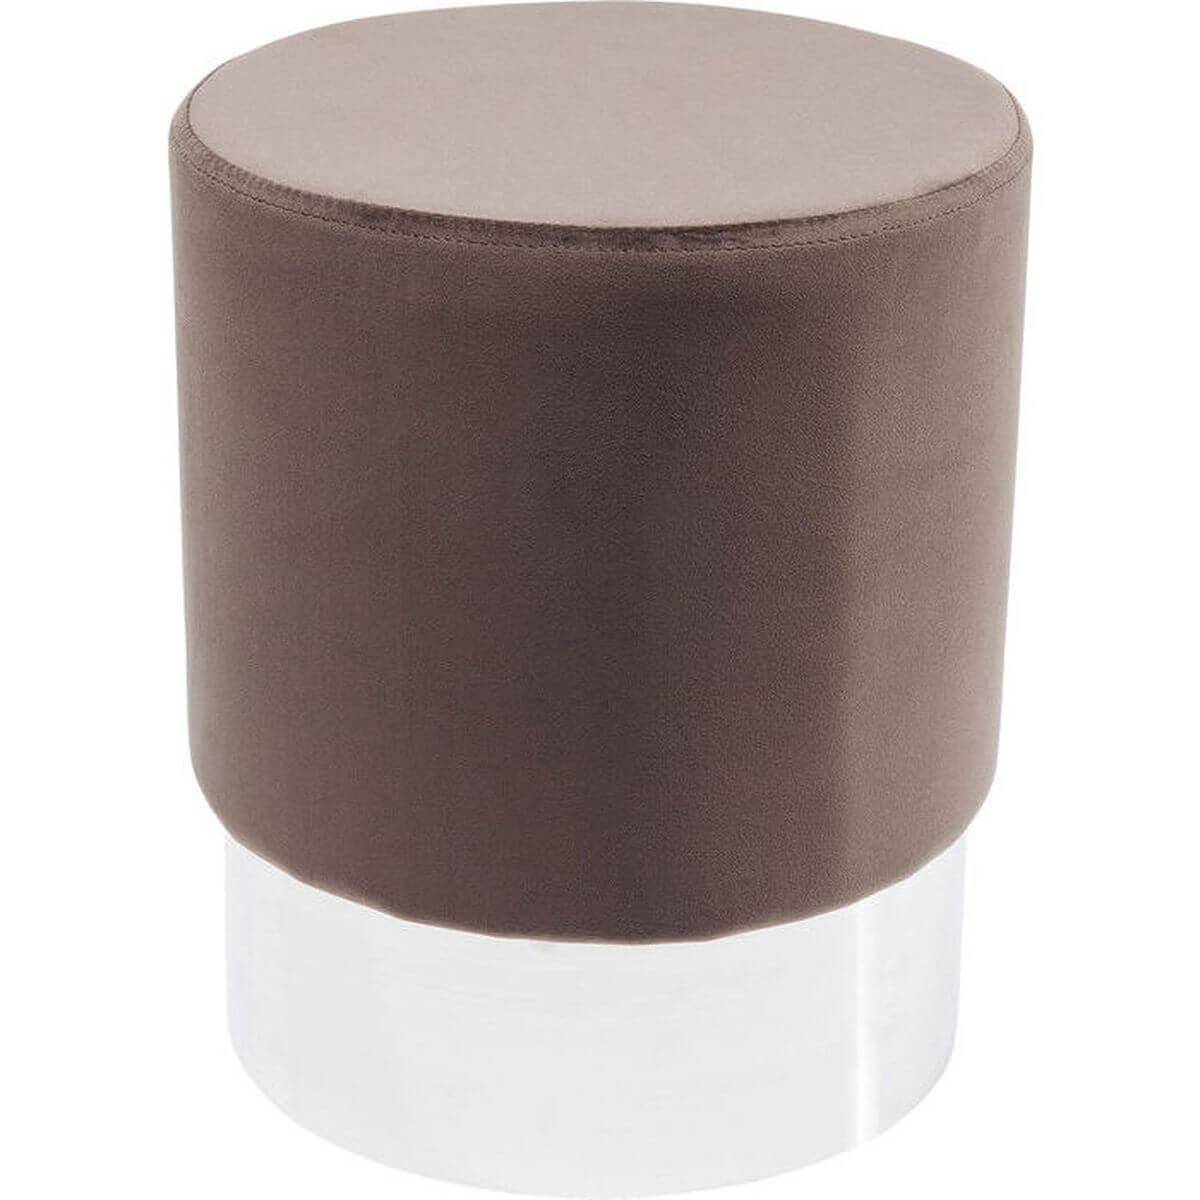 Tabouret CHERRY Kare Design marron/argent 35cm